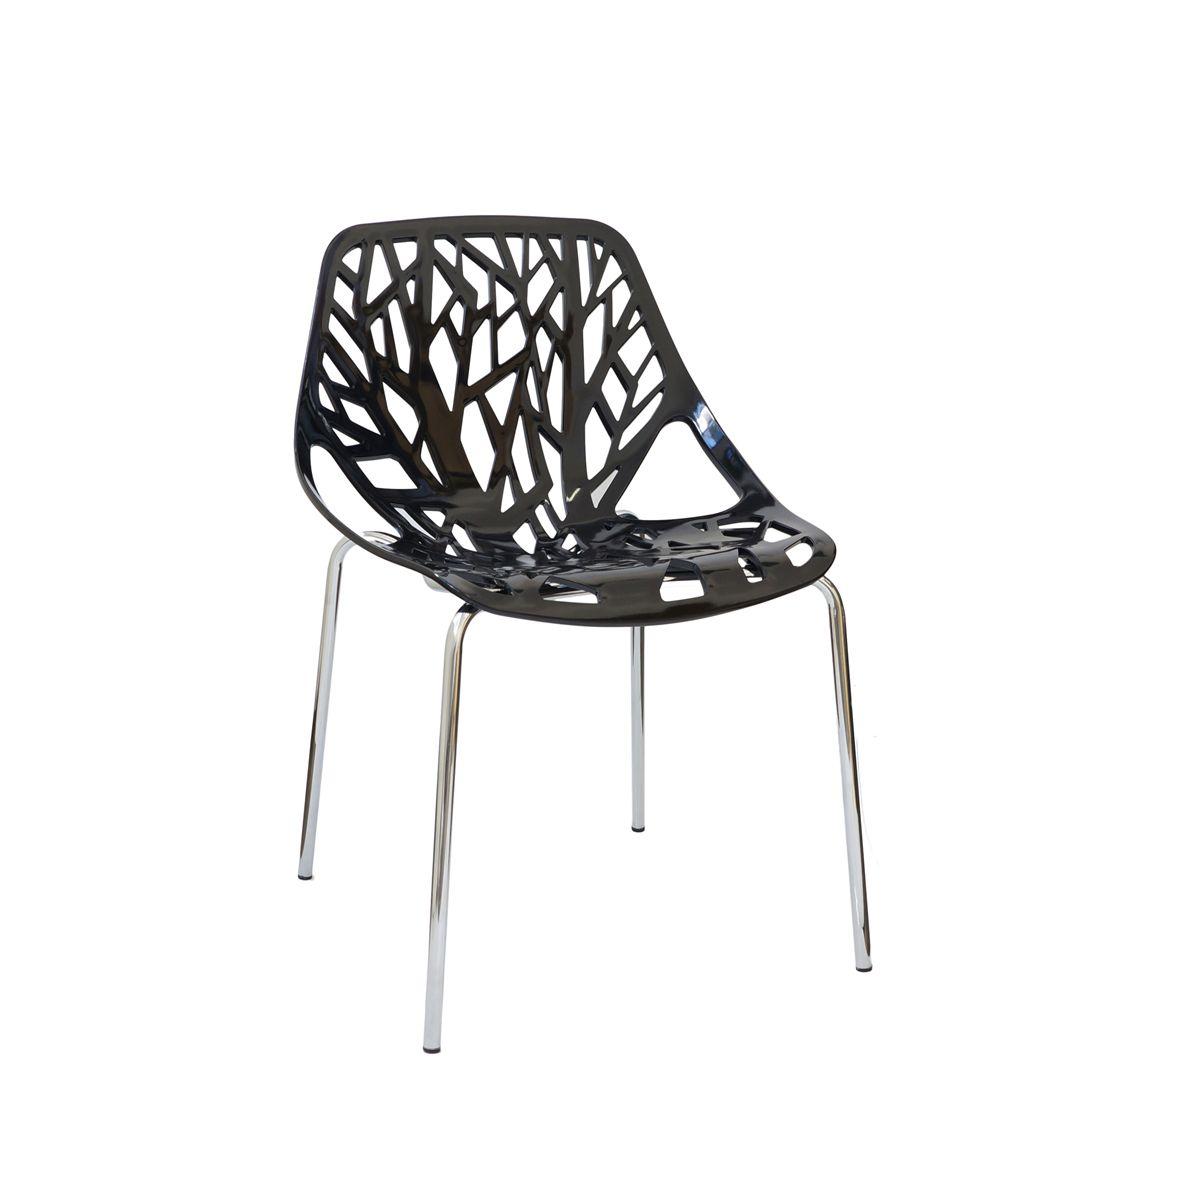 Cadeira Ramos Kiruna em Polipropileno com Base Cromada